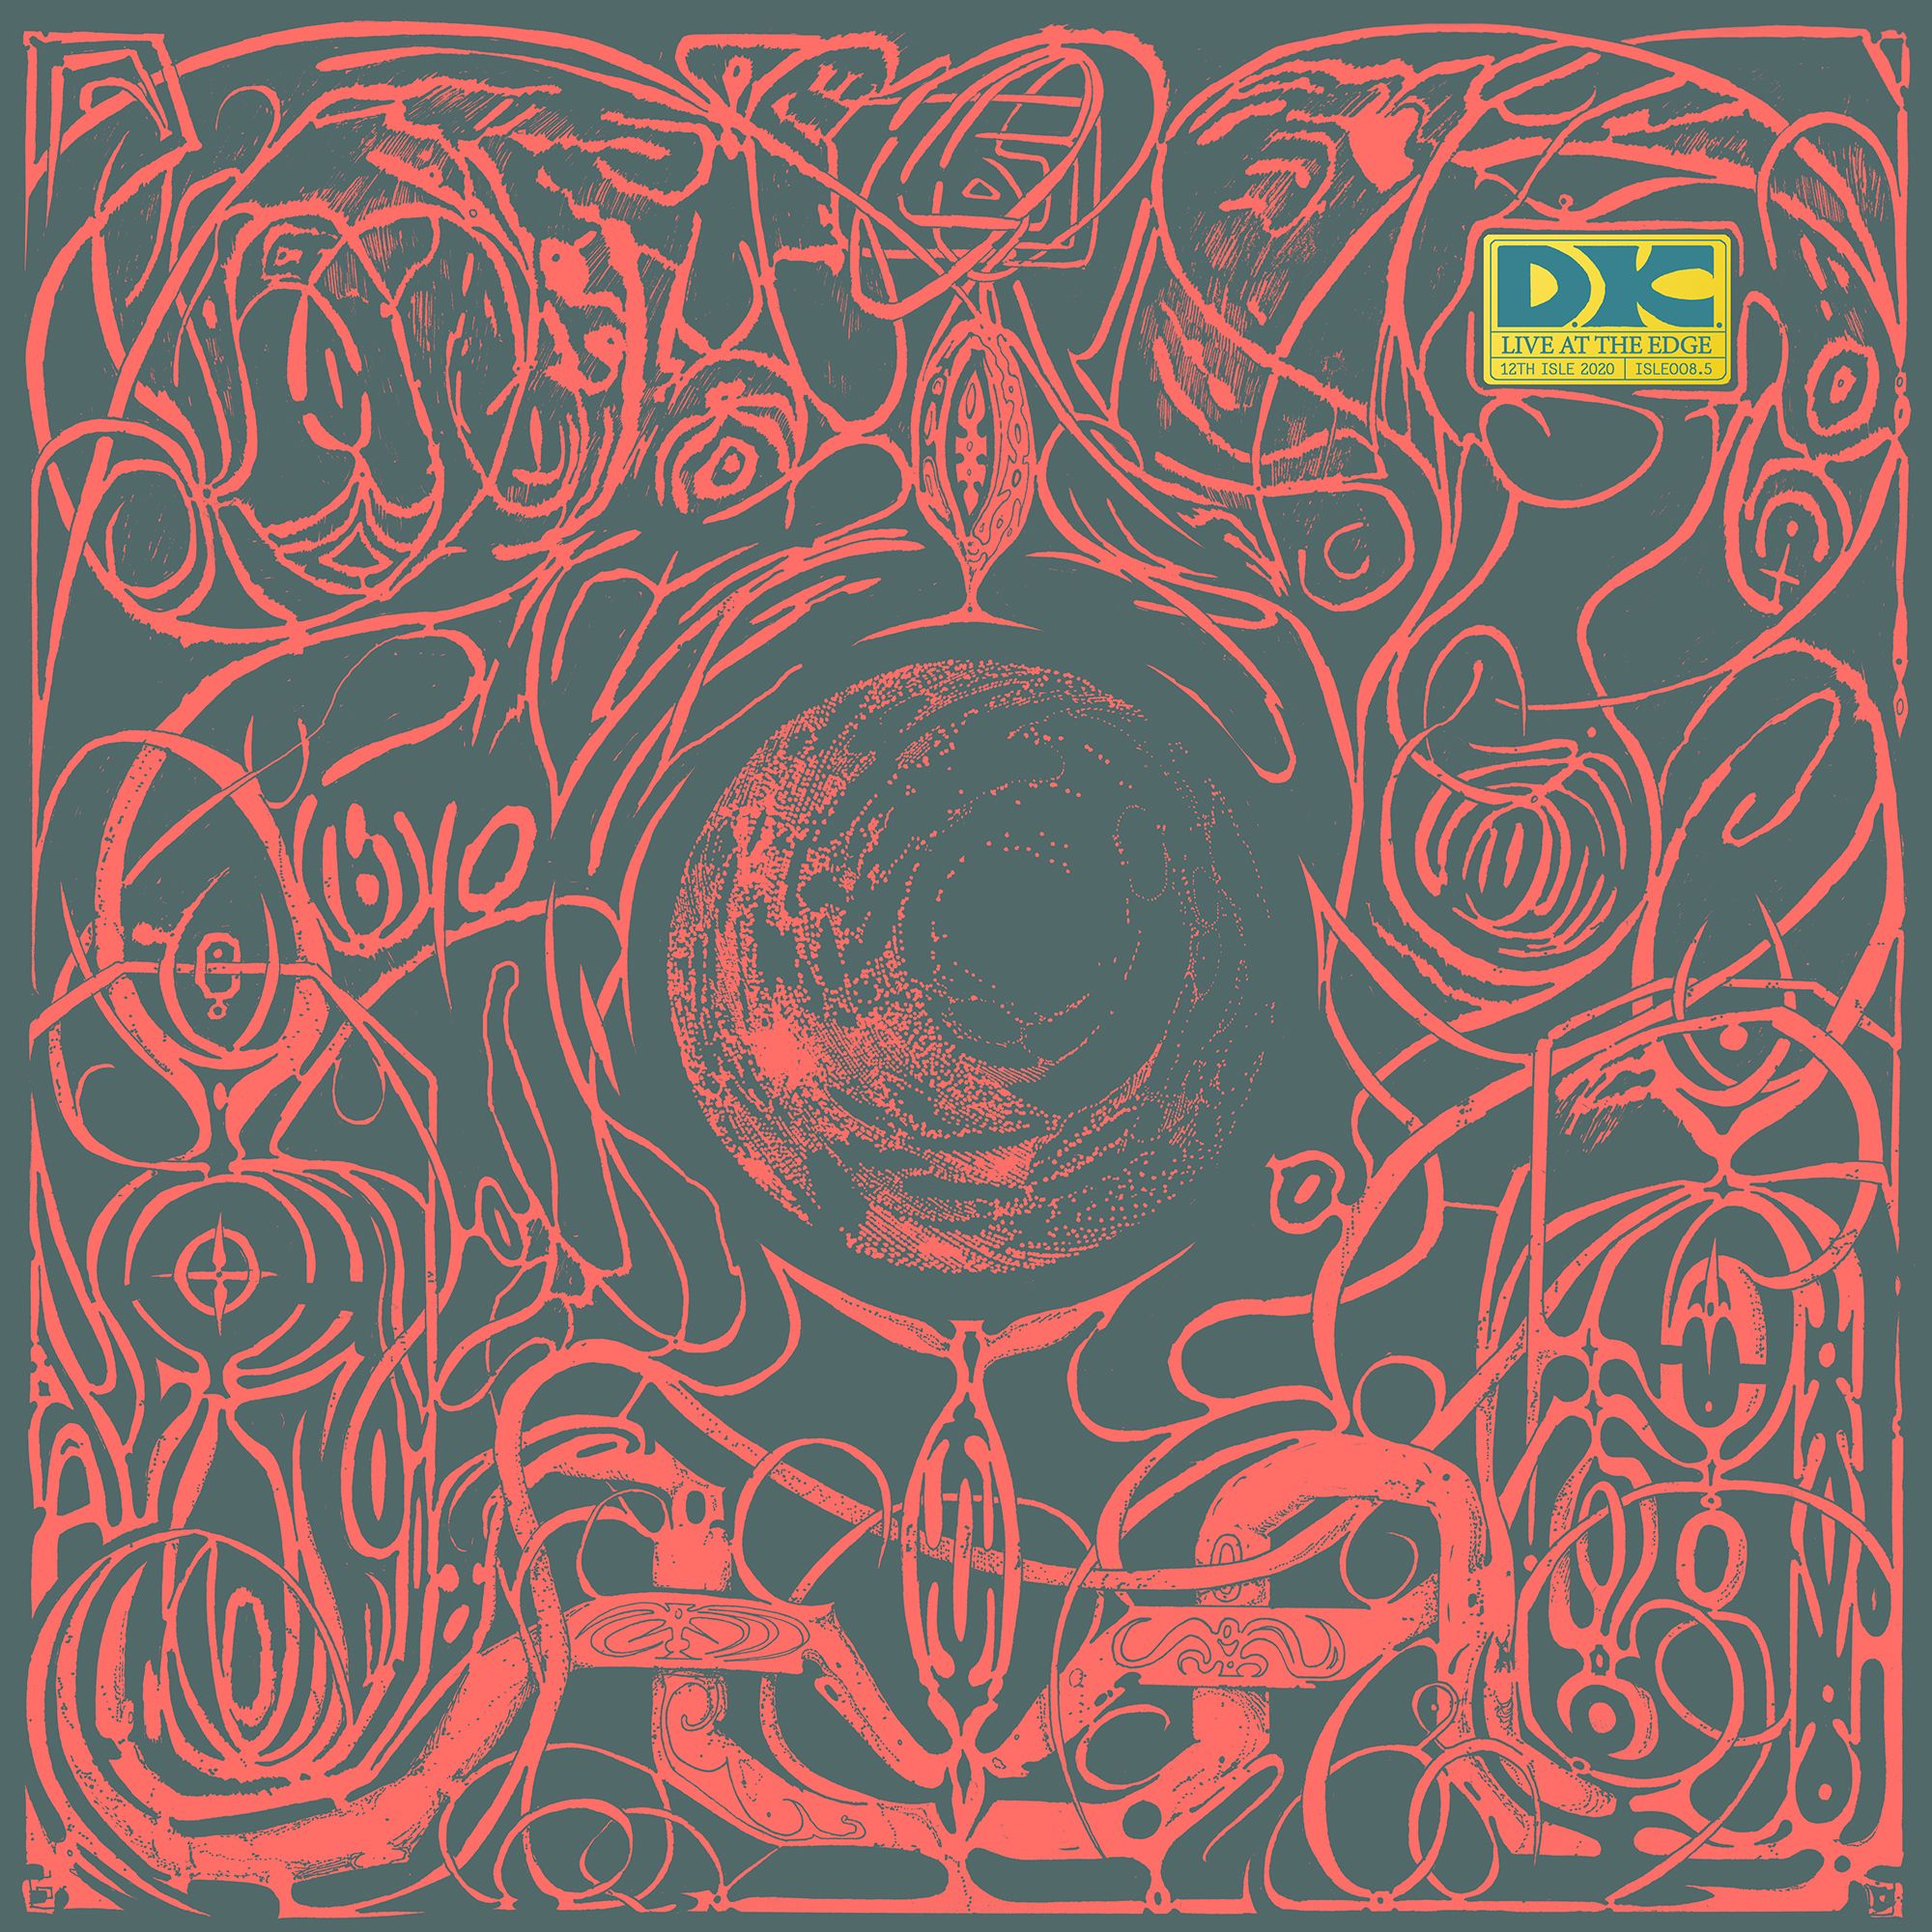 D.K./LIVE AT THE EDGE LP